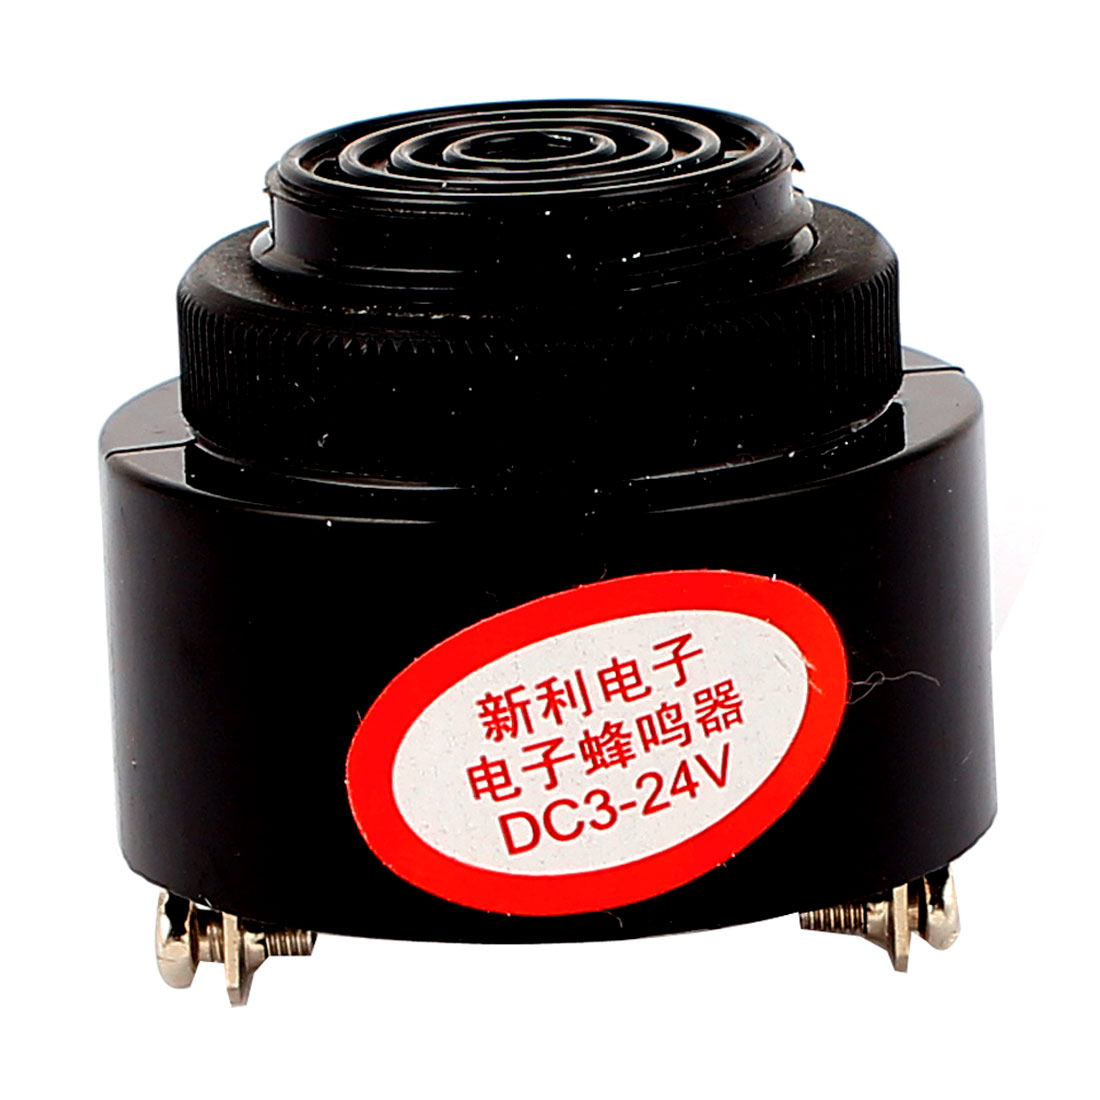 DC 3-24V 85DB Continuous Beep Alarm Electronic Piezo Buzzer Sounder